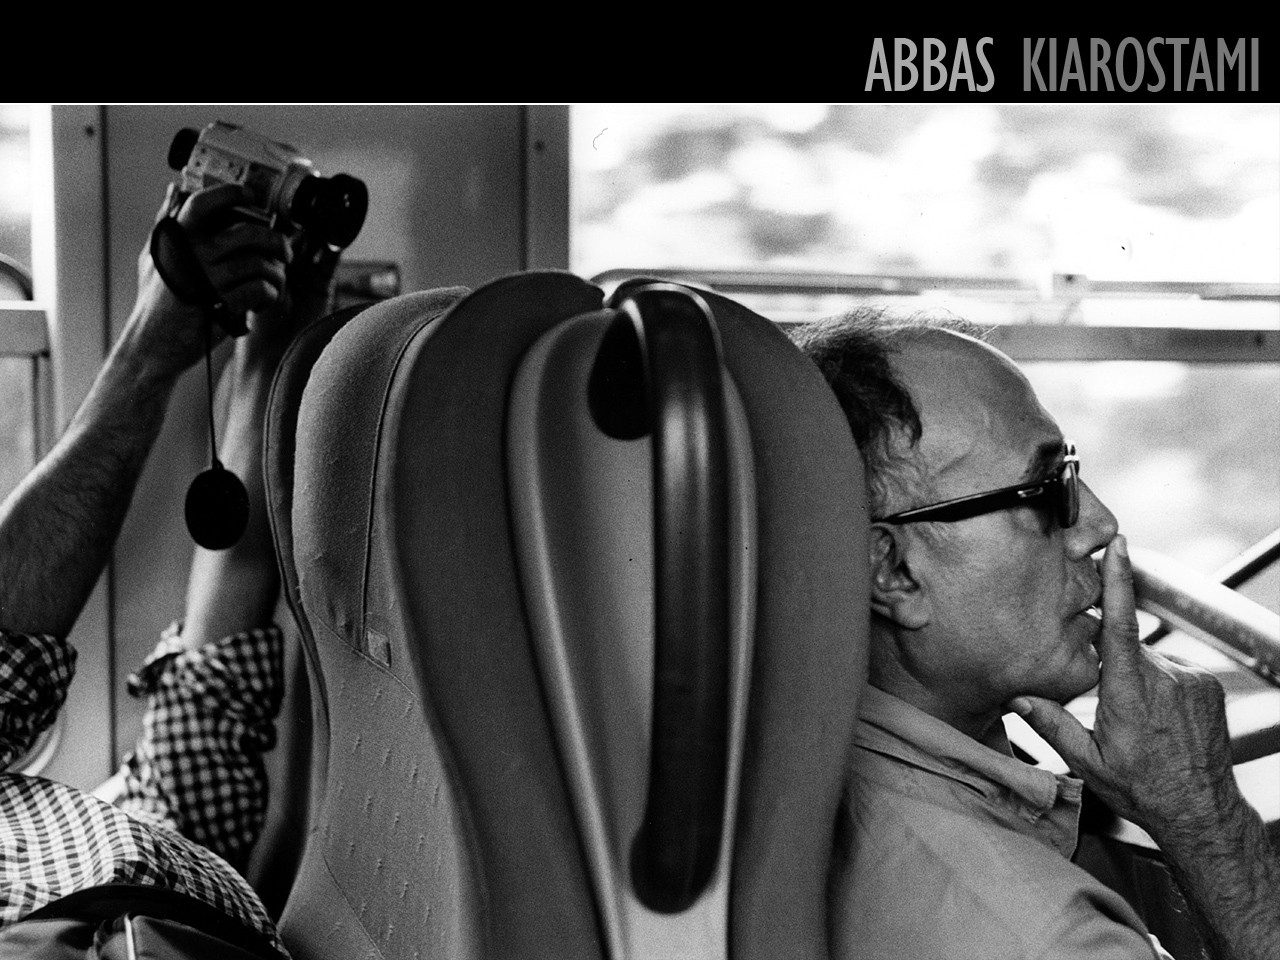 Wallpaper di Abbas Kiarostami